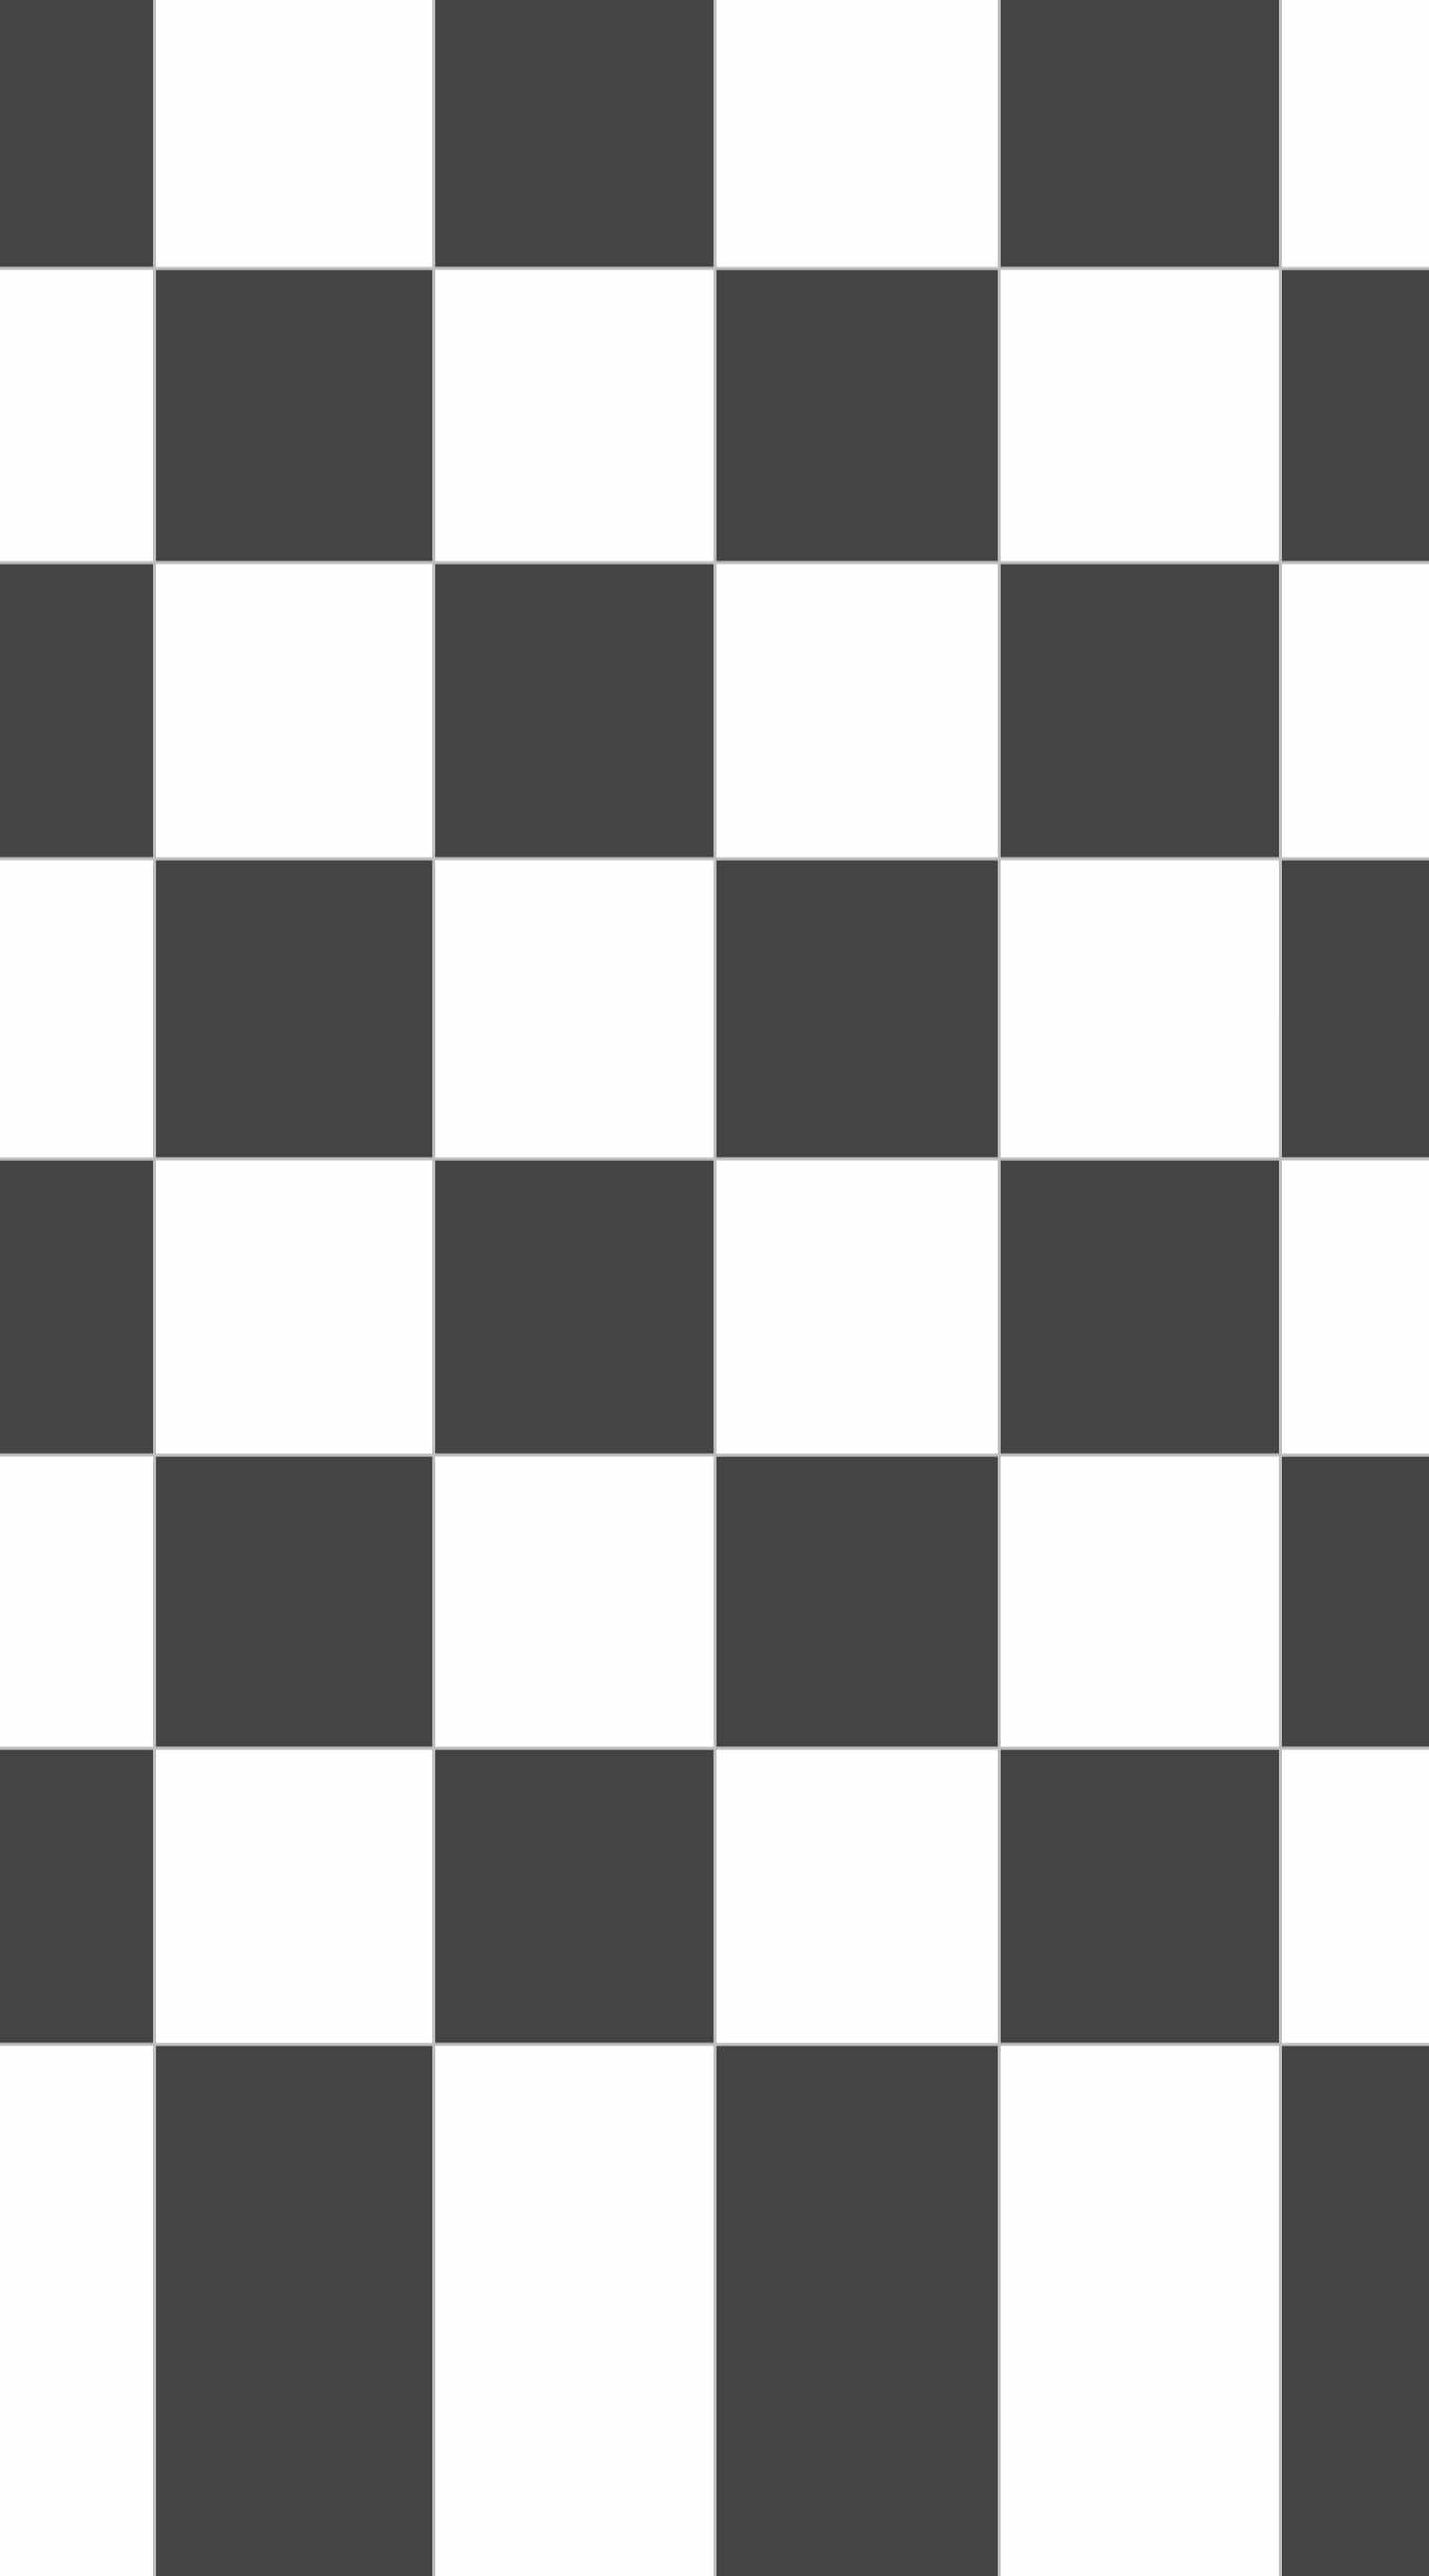 Black And White Checkered Shelf Wallpaper Sc Iphone6splus